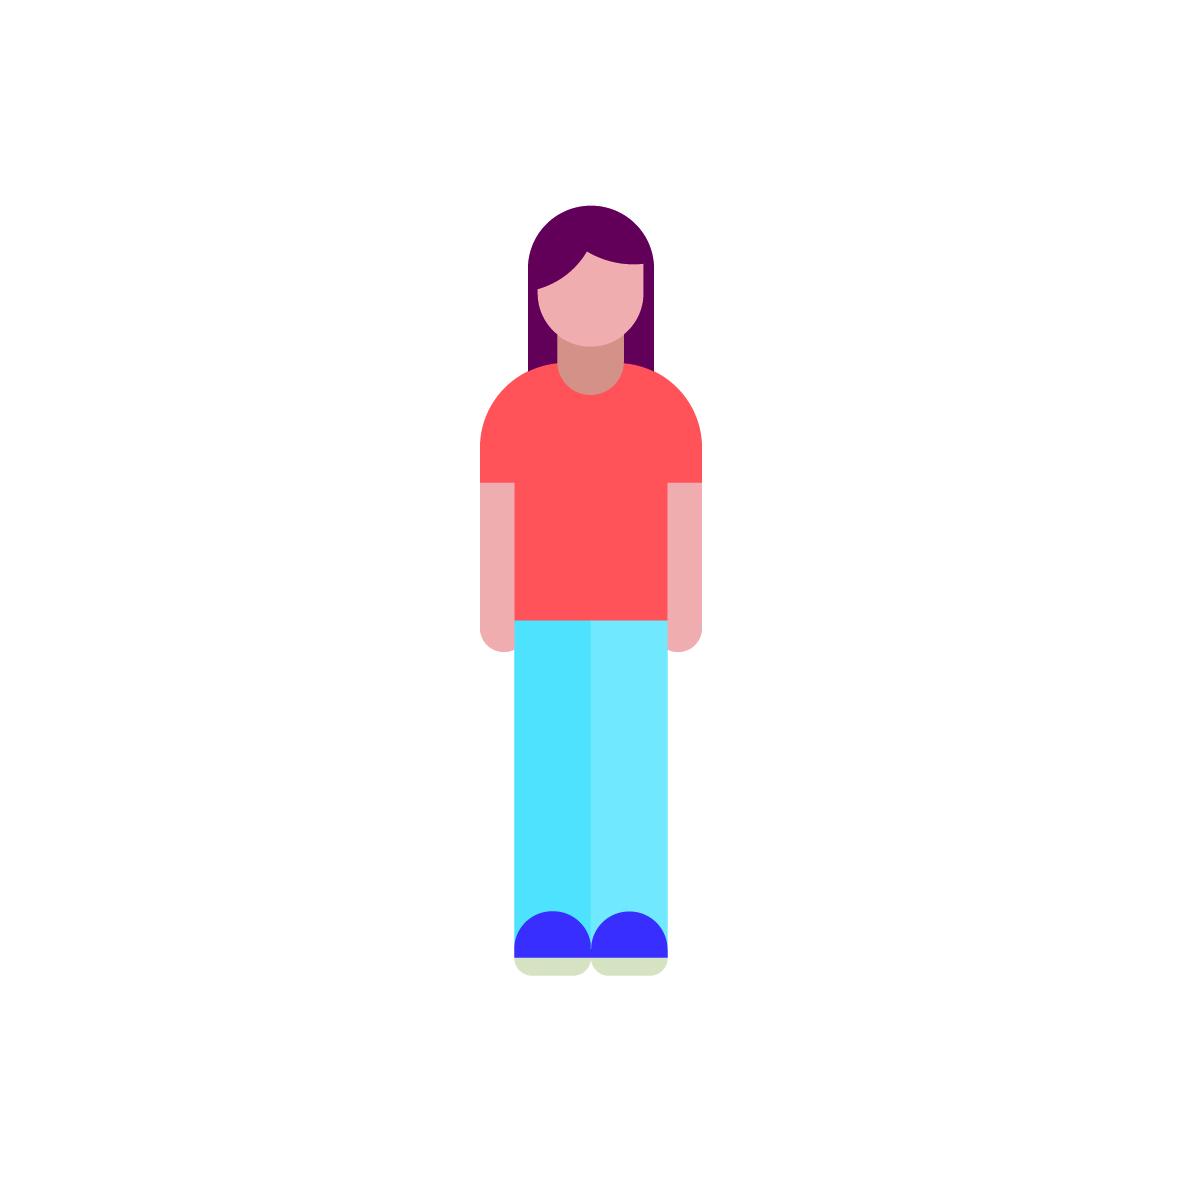 Woman pictogram